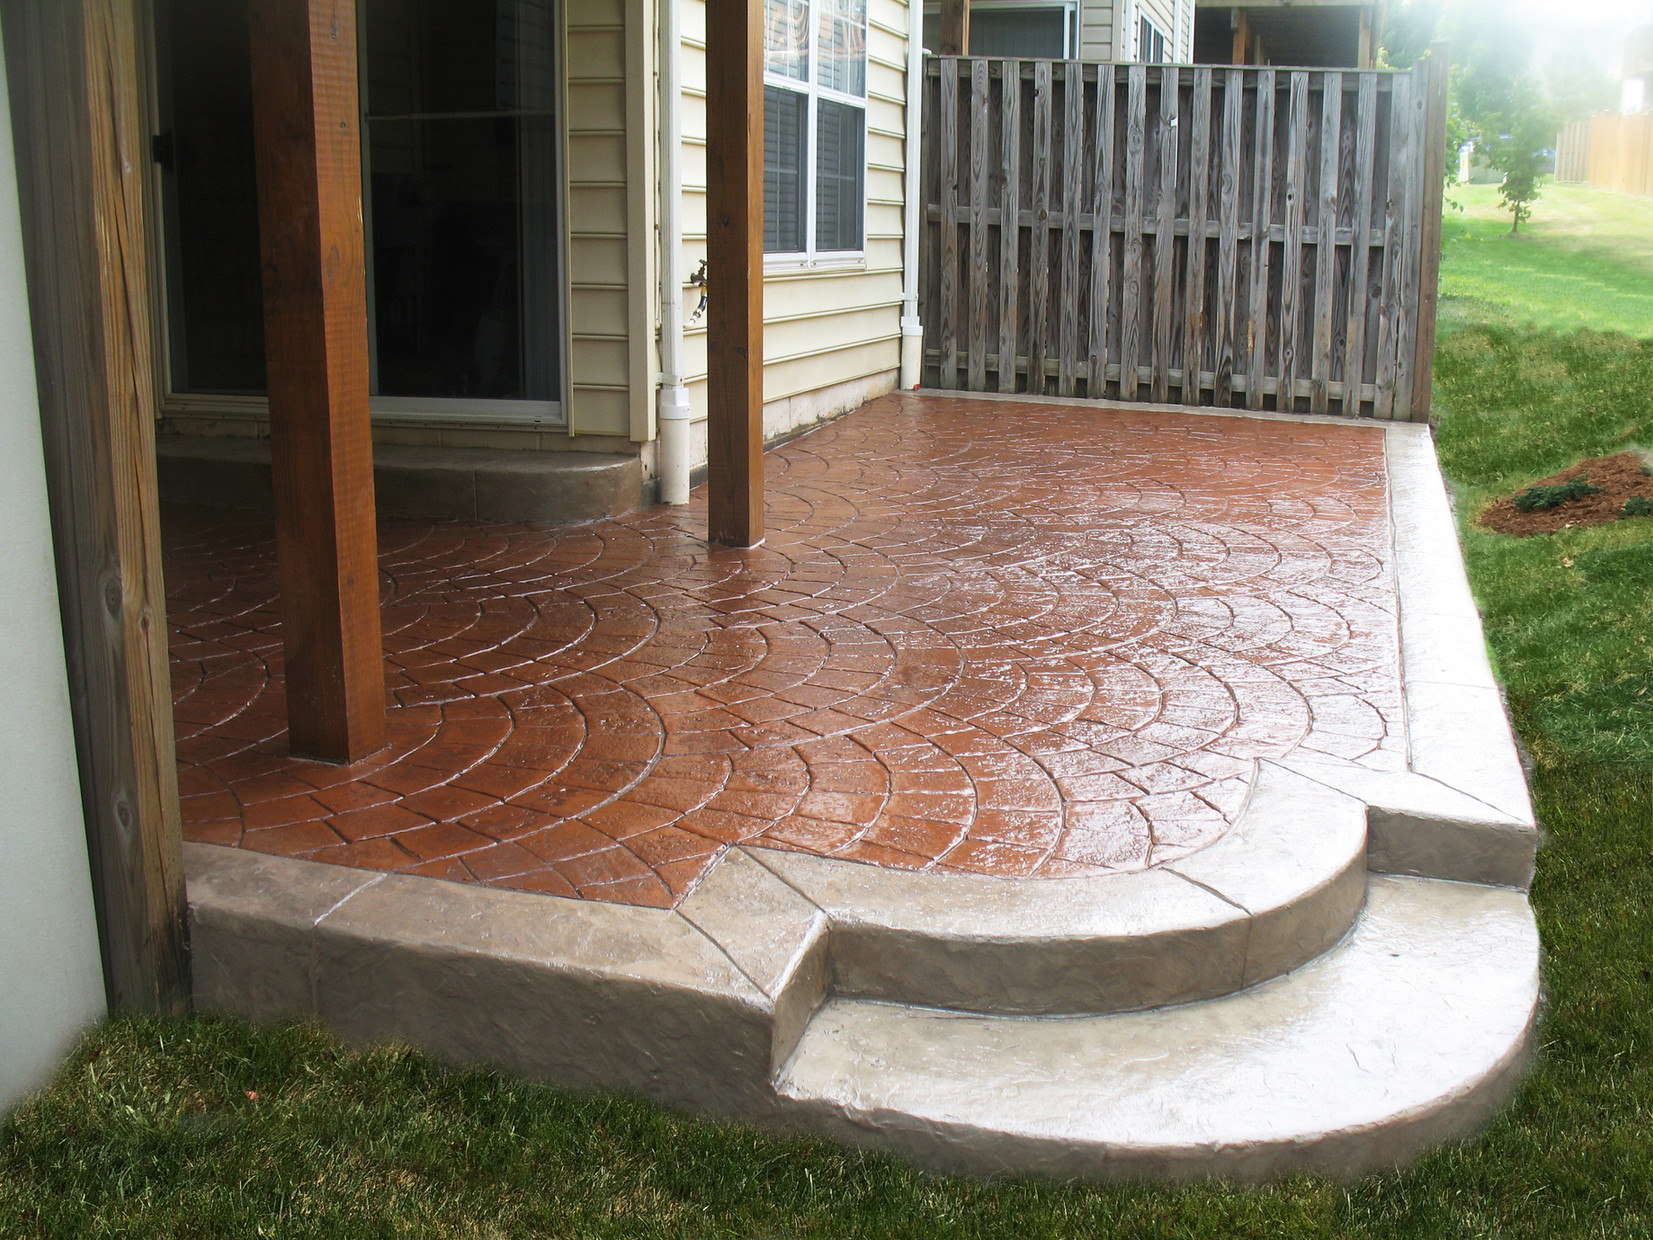 Stamped Concrete Patio Designs by Greystone Masonry | PATIOS